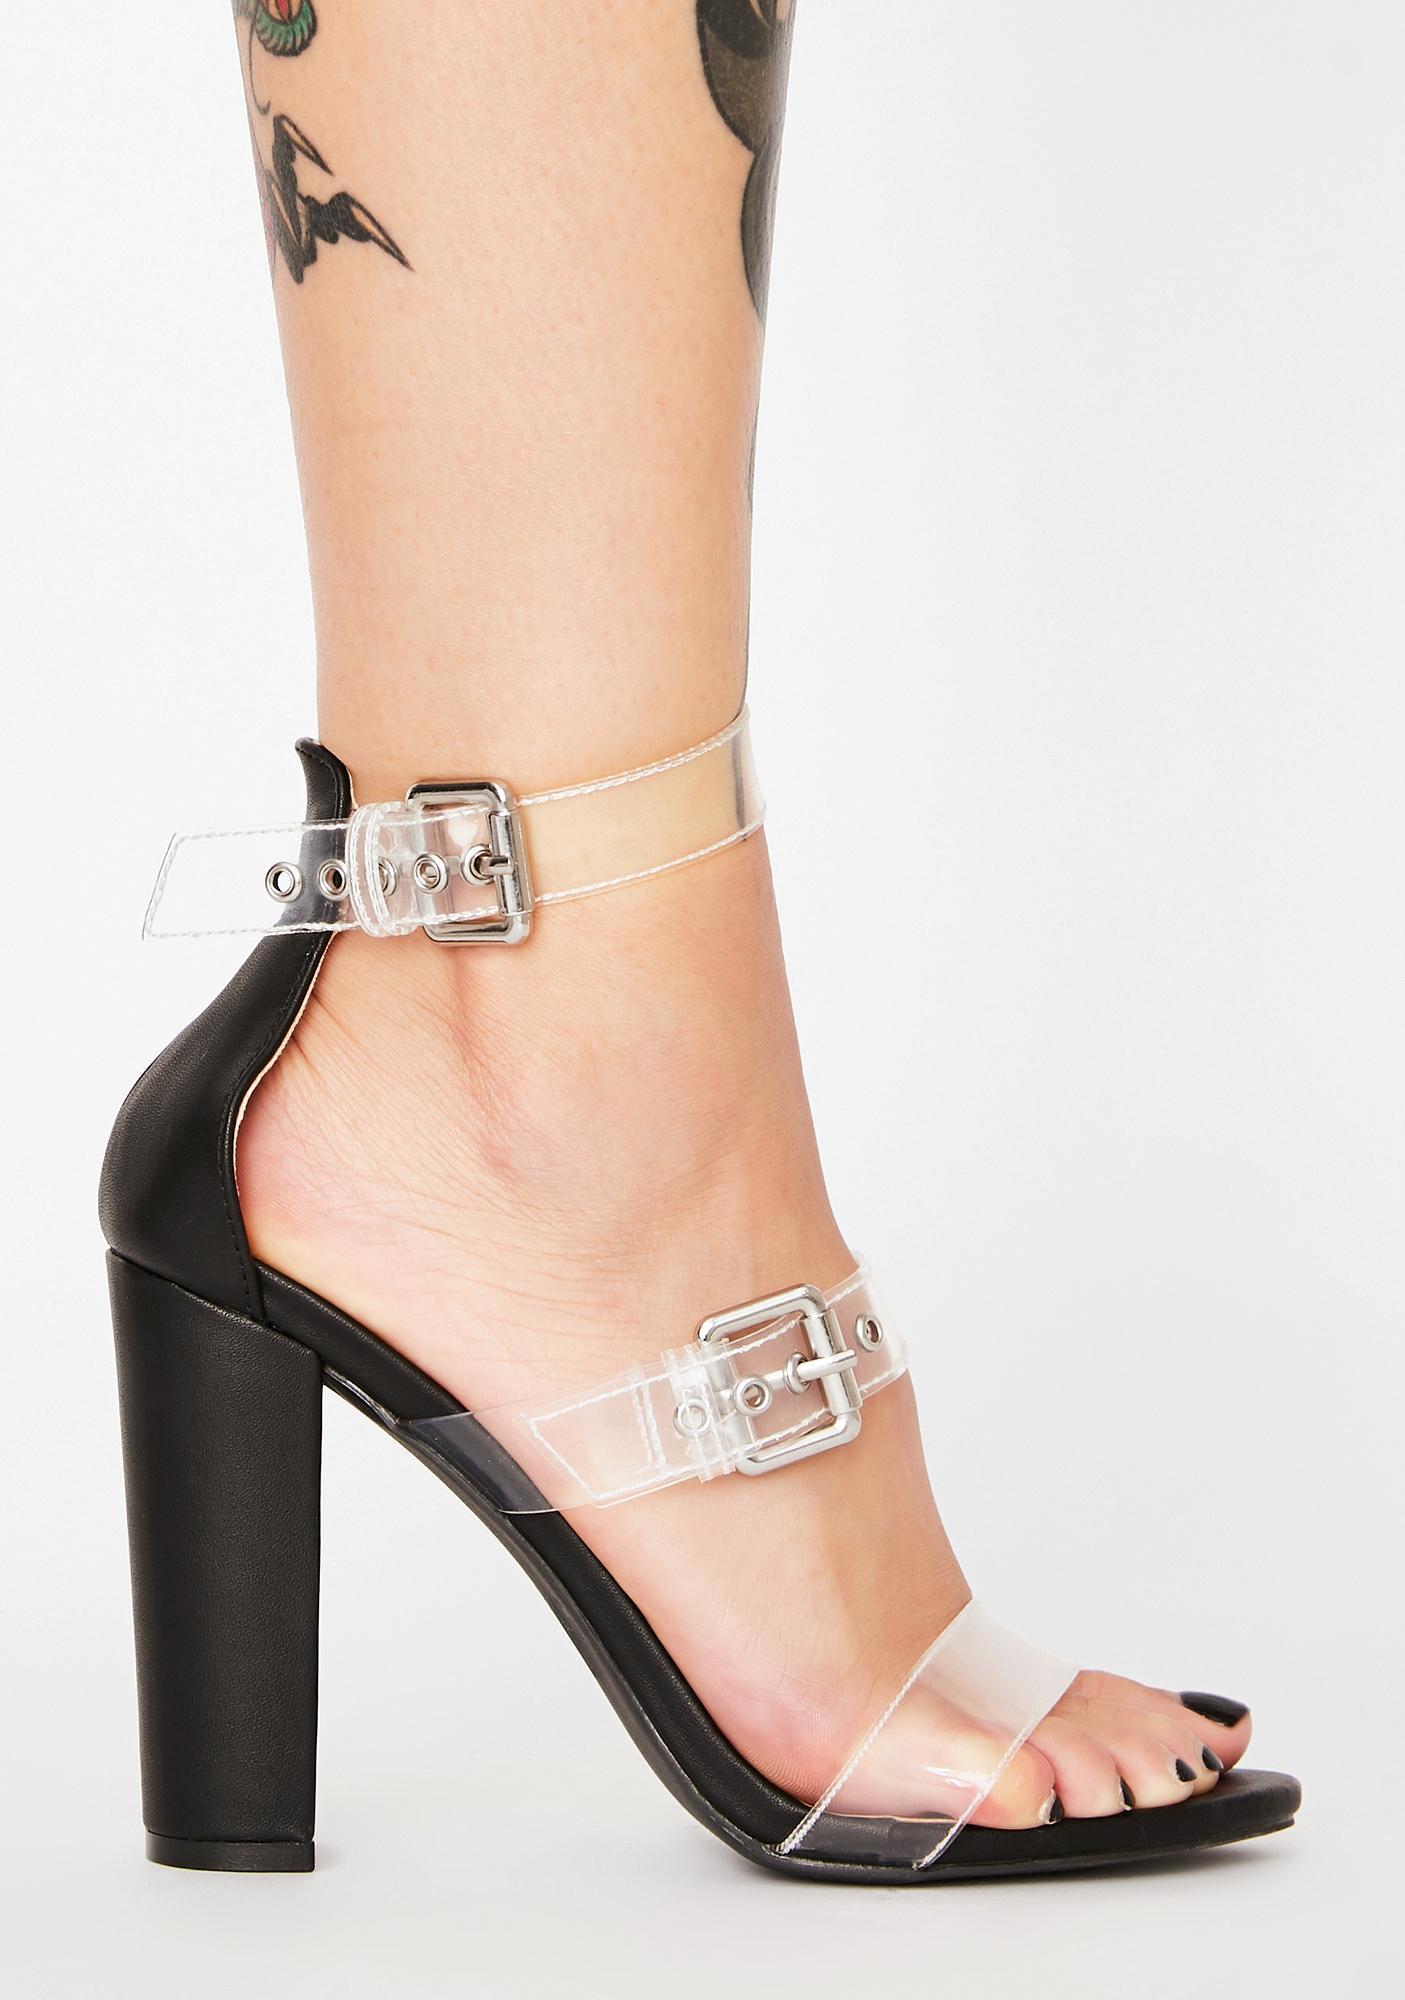 Always Stuntin' PVC Heels